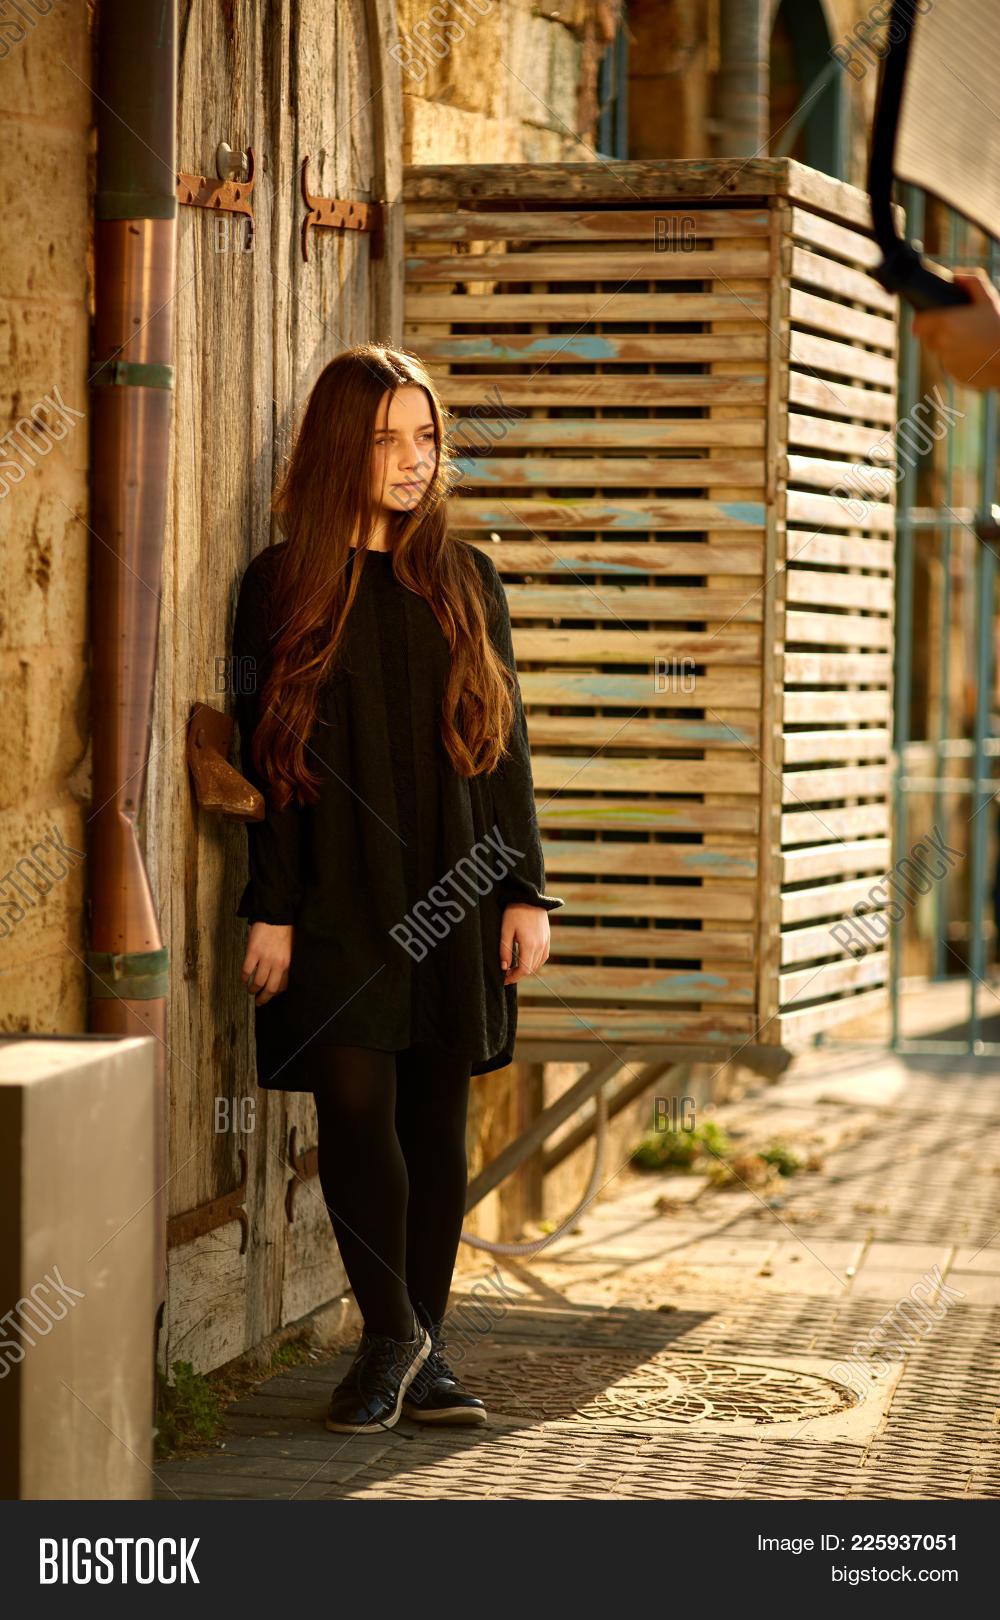 6dee6e7302e Young Beautiful Stylish Girl Walking And Posing In Short Black Dress In  City Near Fountains.